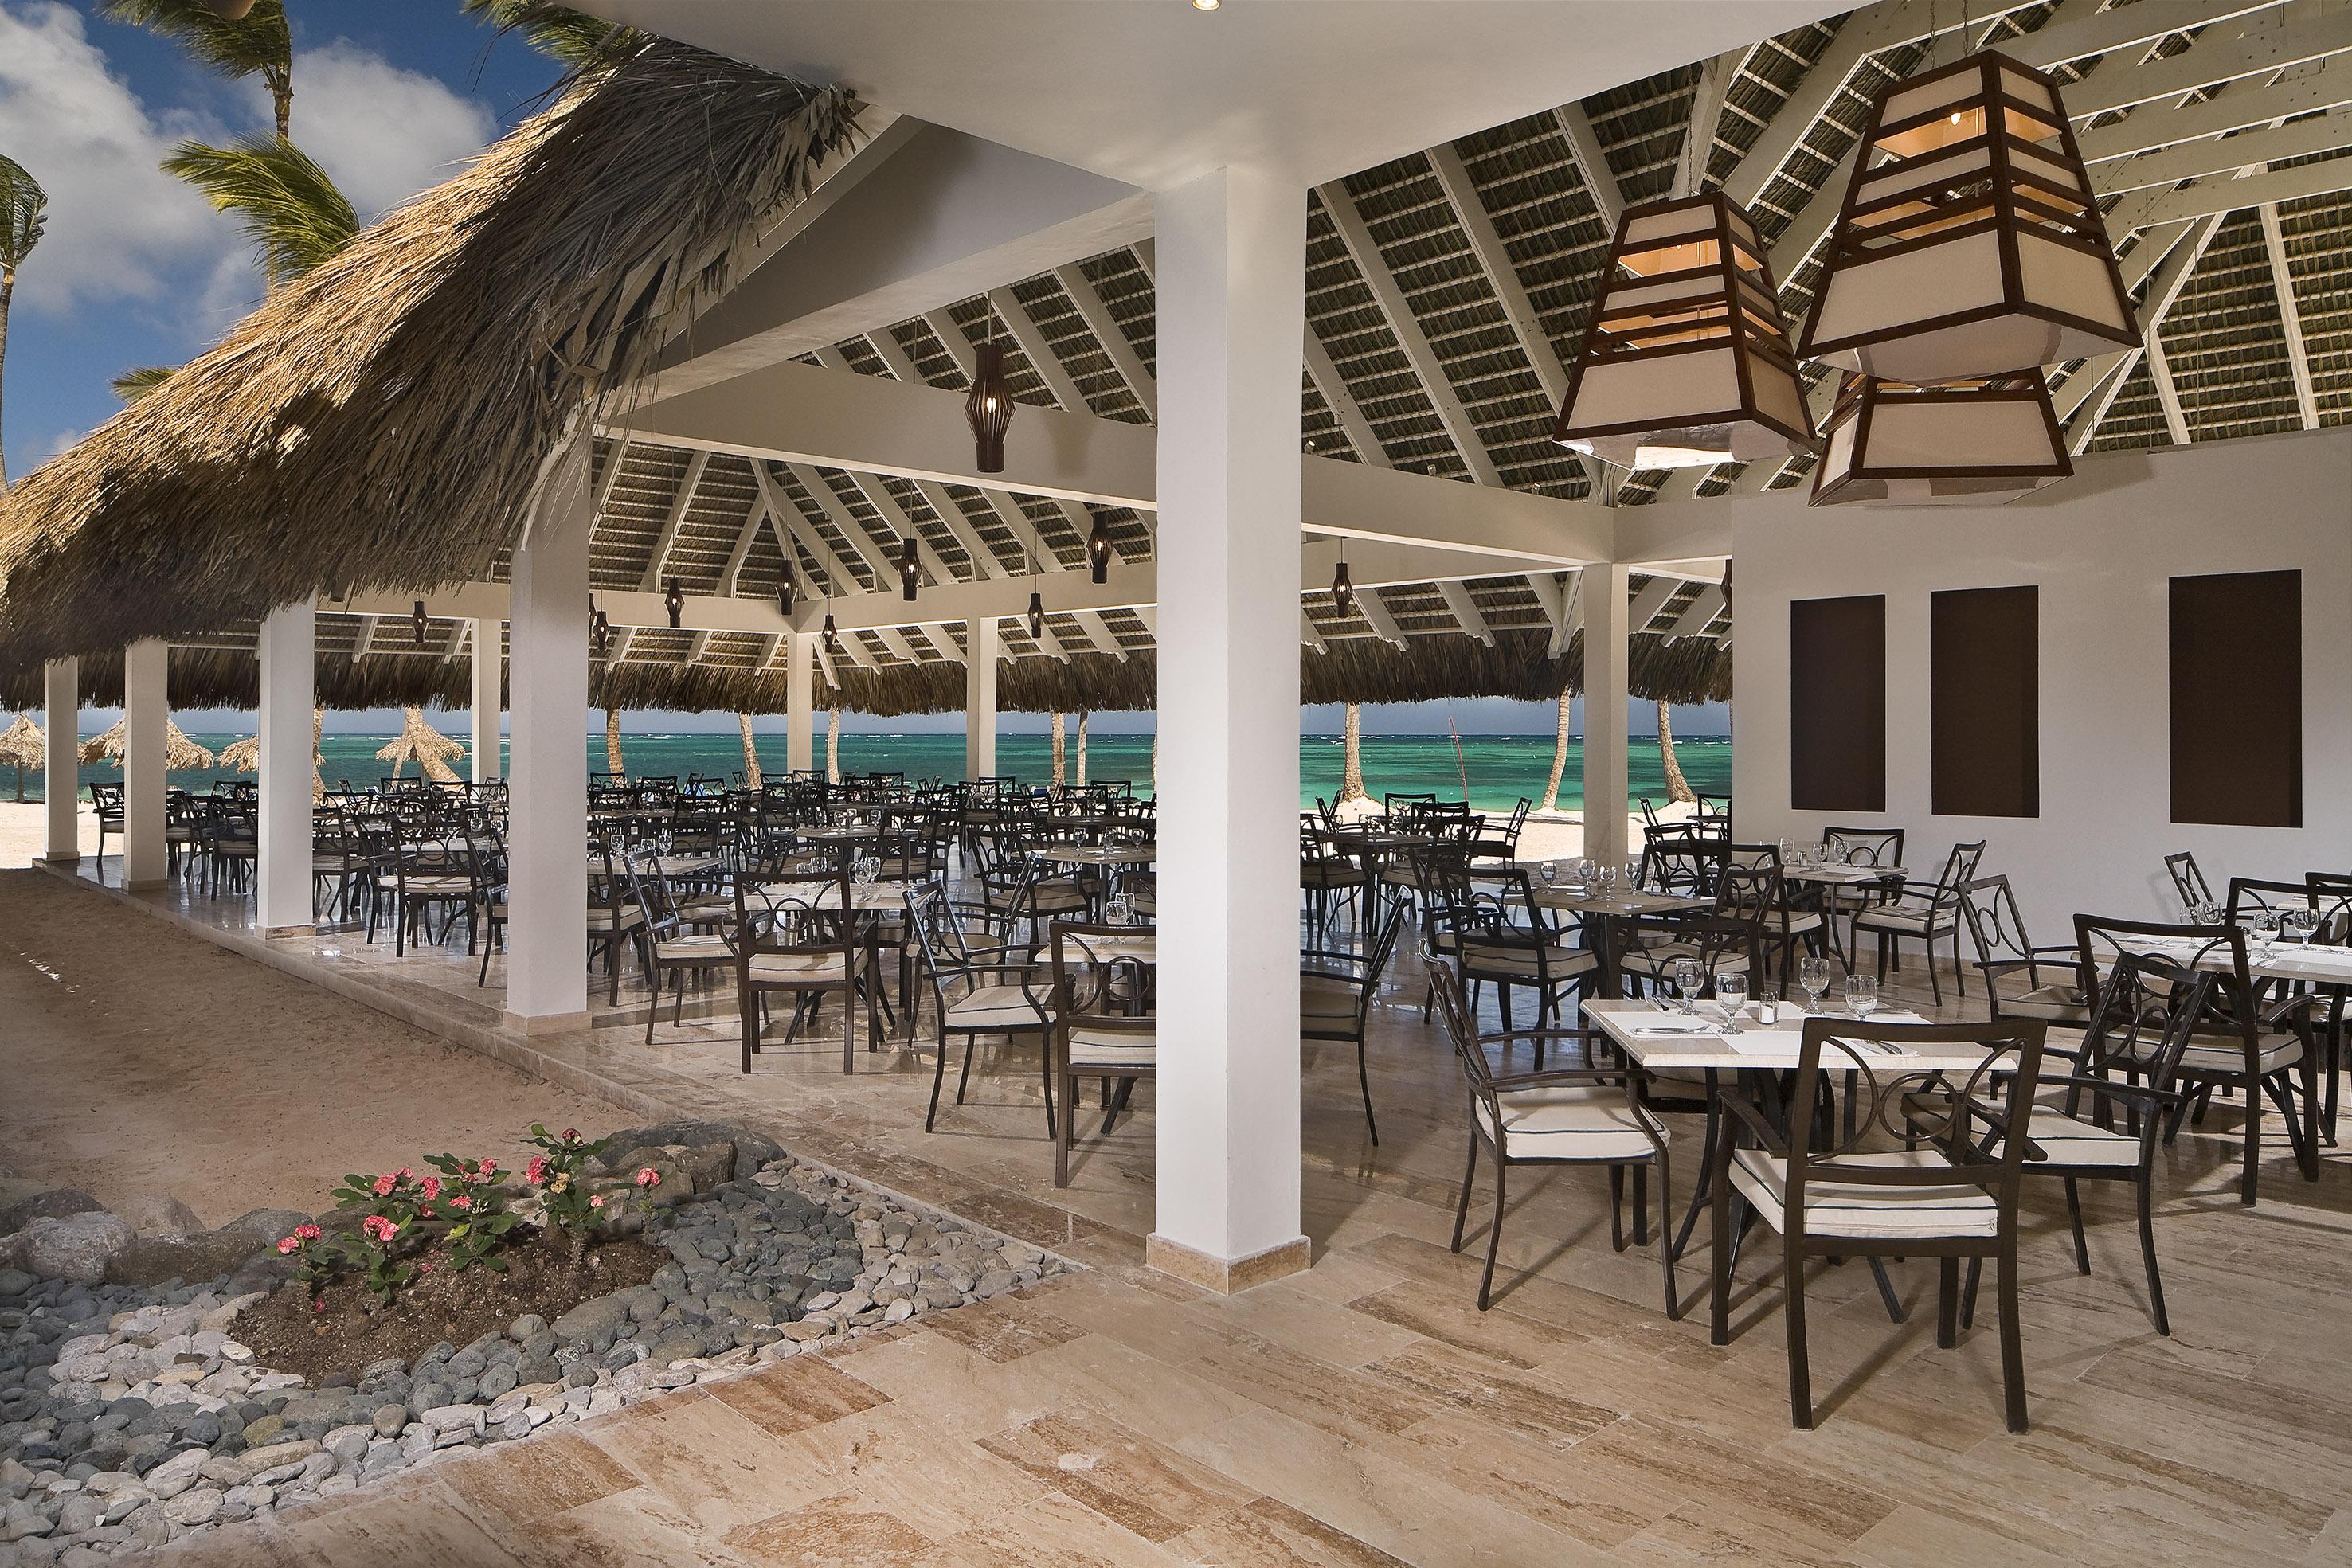 22aMeliaCaribeTropical-AgoraBuffetRestaurant[1].jpg